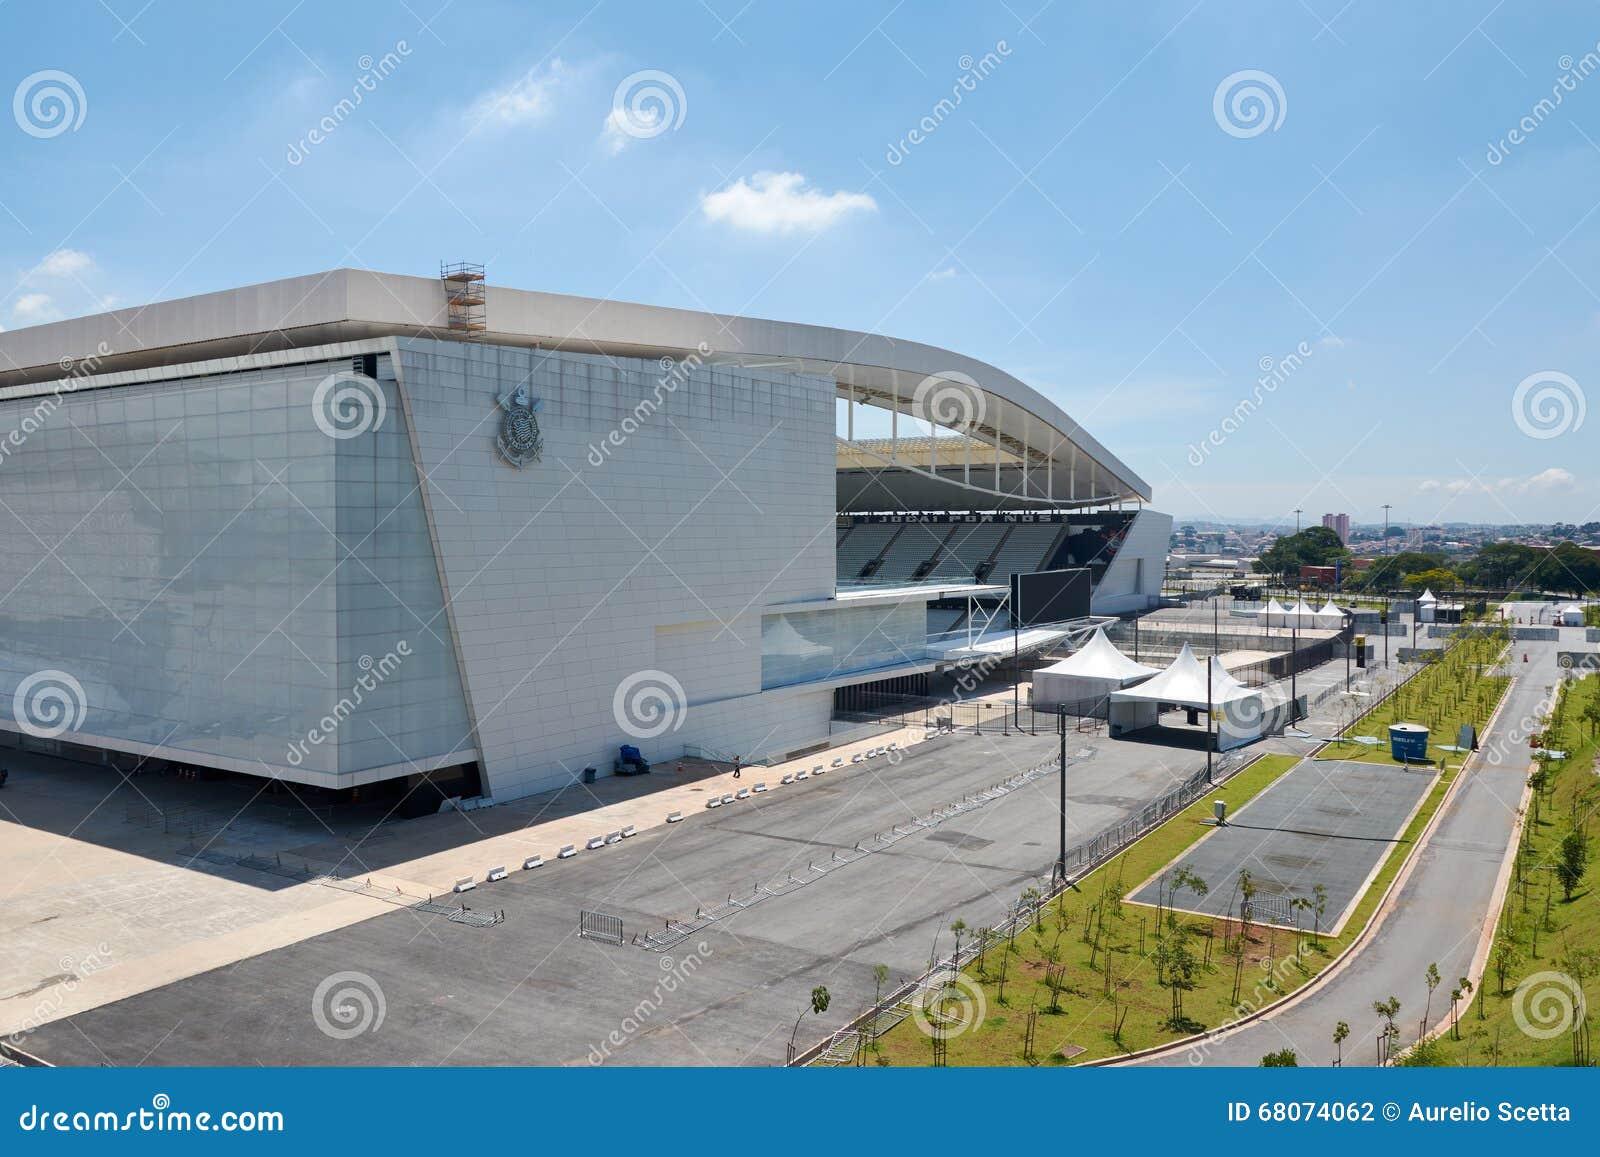 0fd95a545df54 Stadium of sport club corinthians paulista in sao paulo brazil jpg 1300x957 Sport  club corinthians paulista